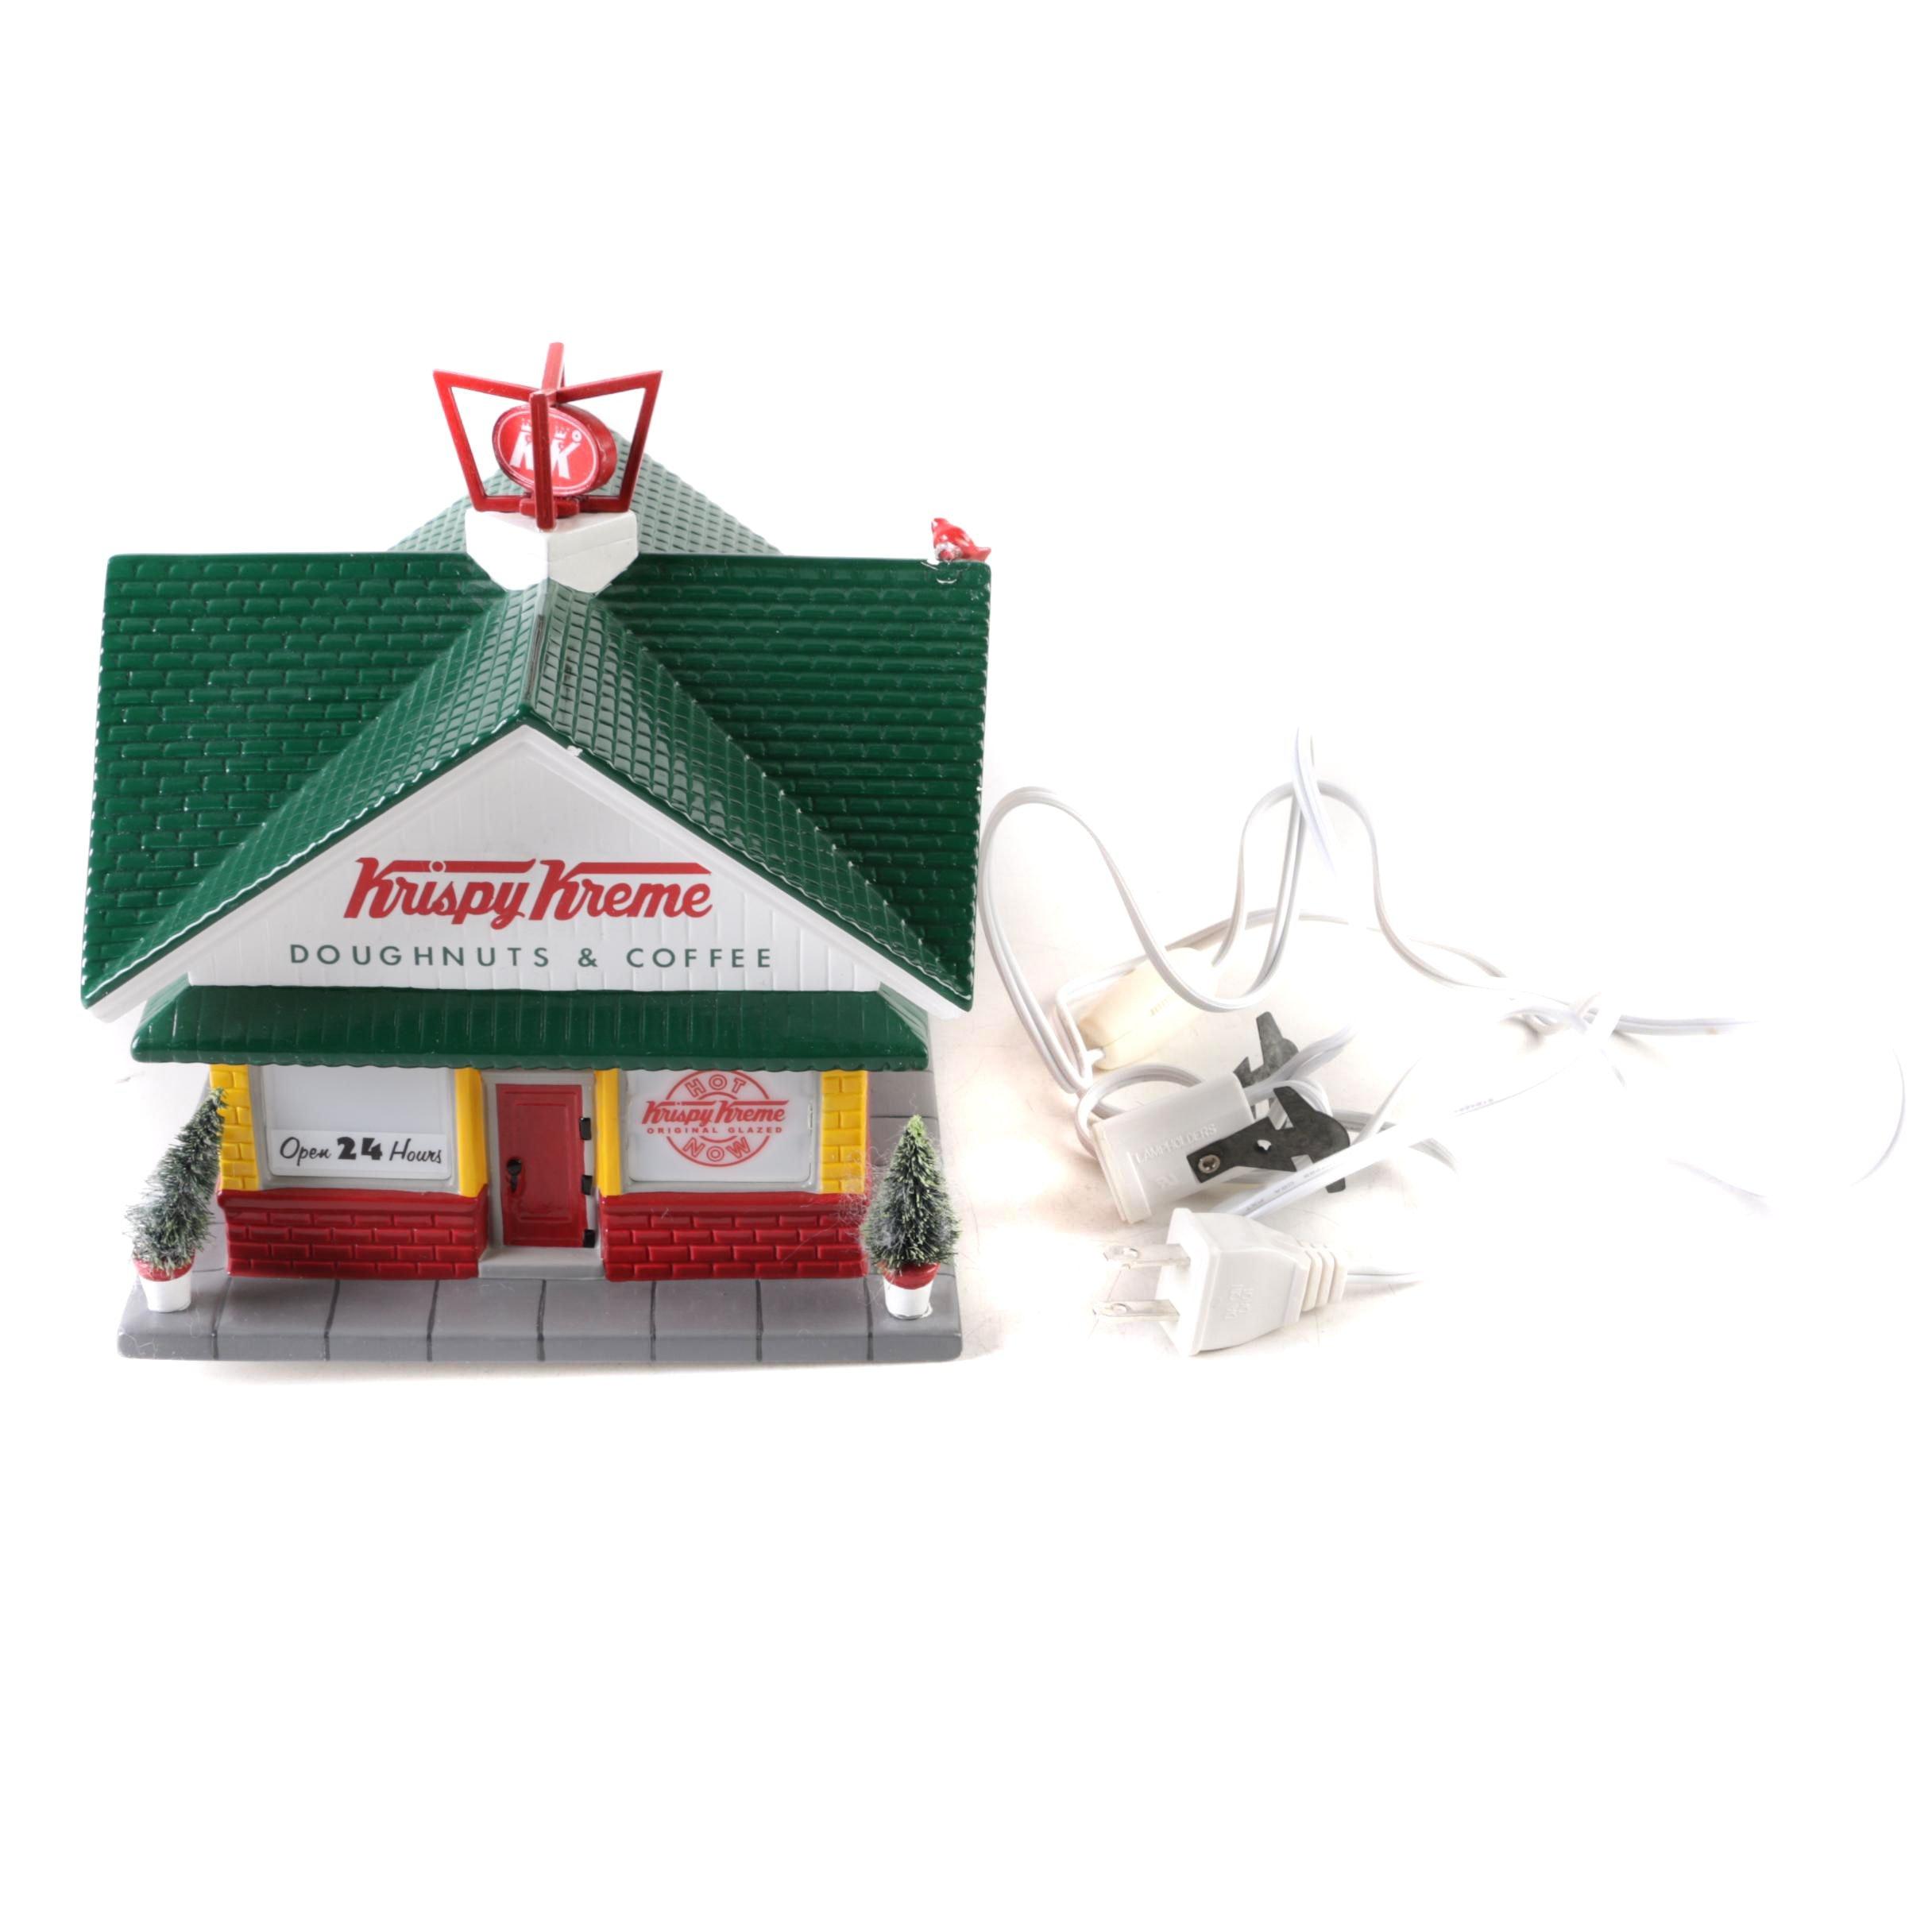 Department 56 Krispy Kreme Miniature Light Up Snow Village Building